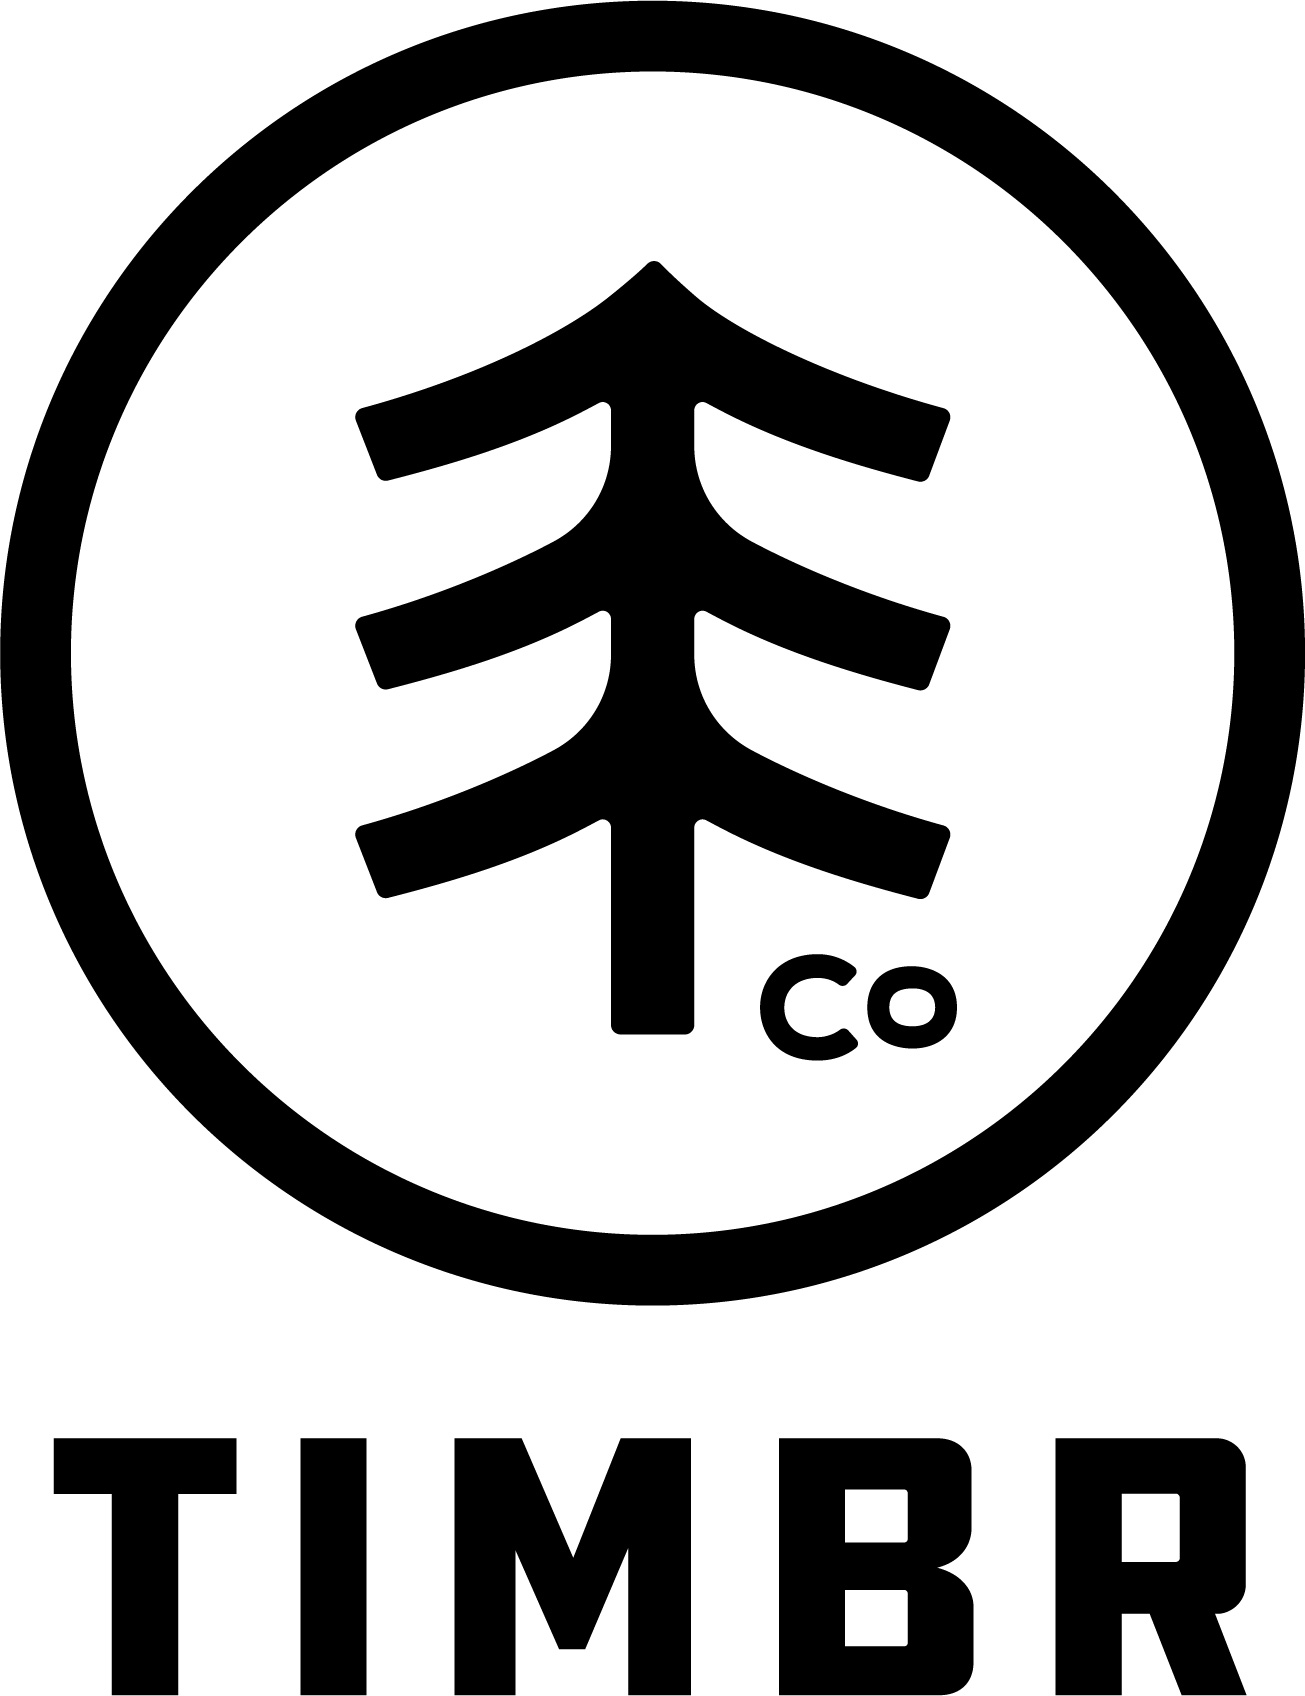 TIMBR logo.jpeg